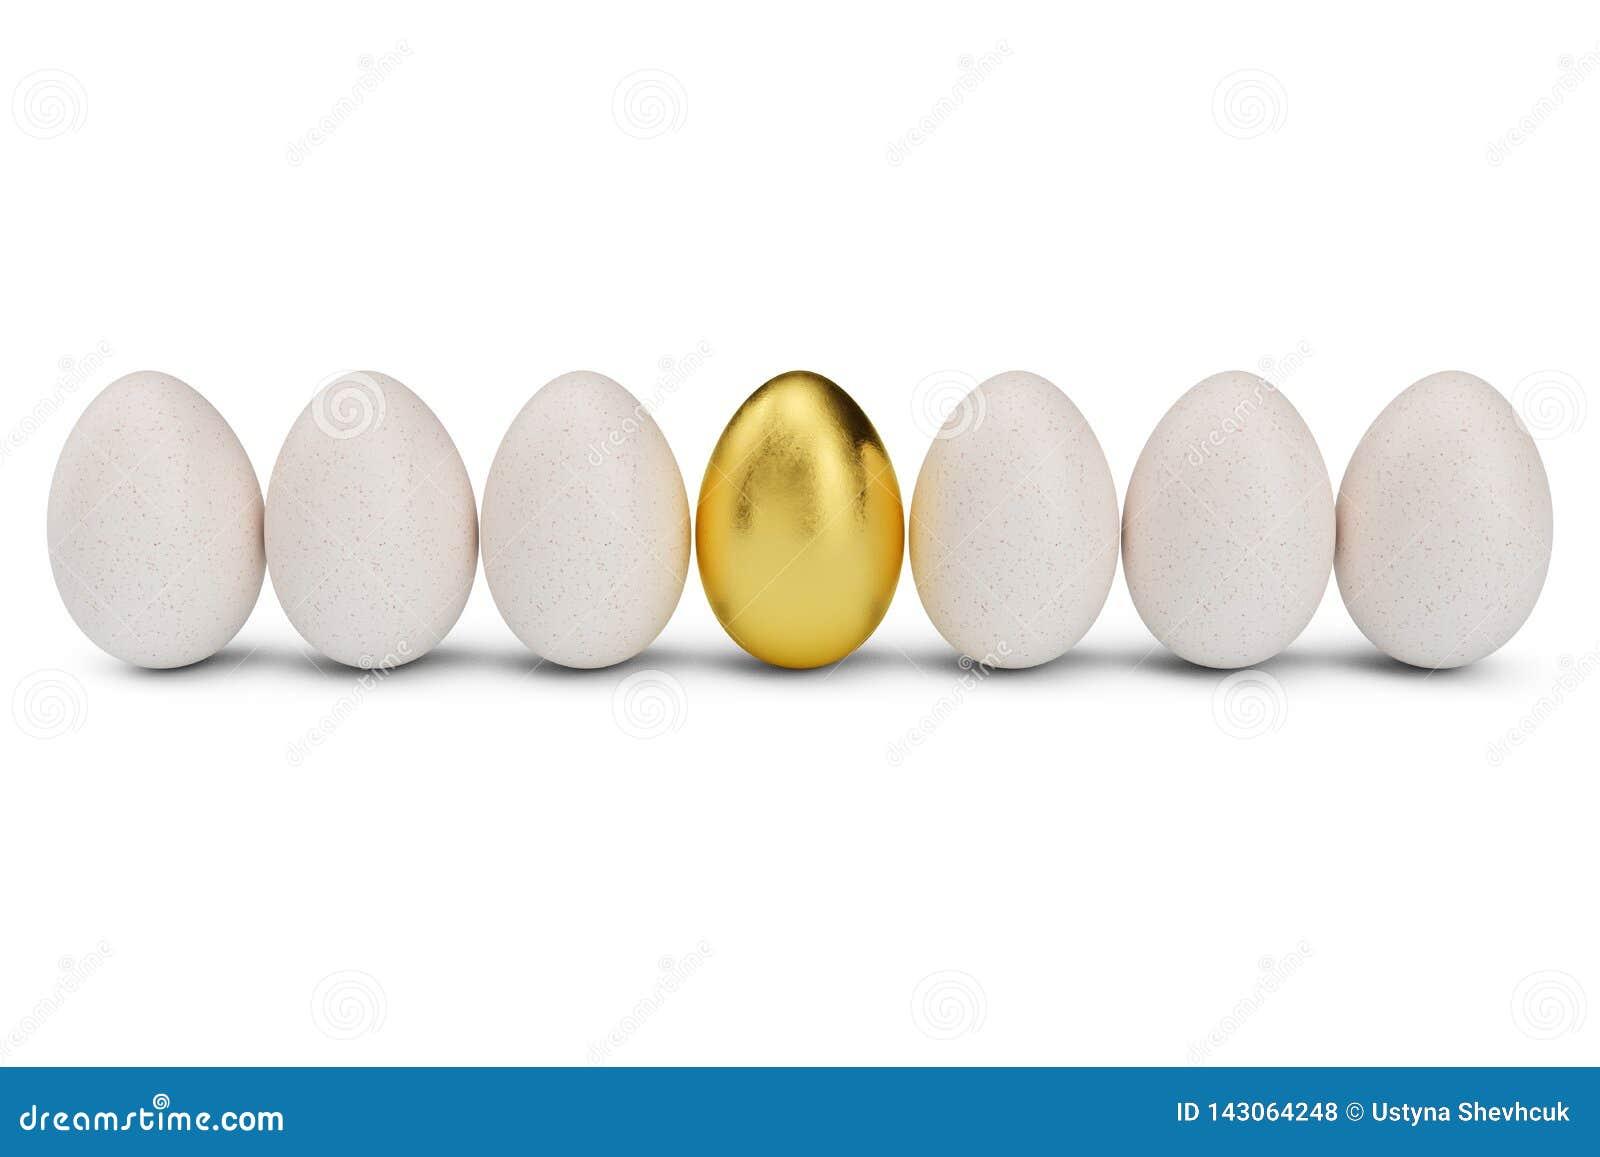 Golden egg around white eggs in row. Golden egg closeup. Golden egg as a sign of wealth, luxury. Egg as a symbol of